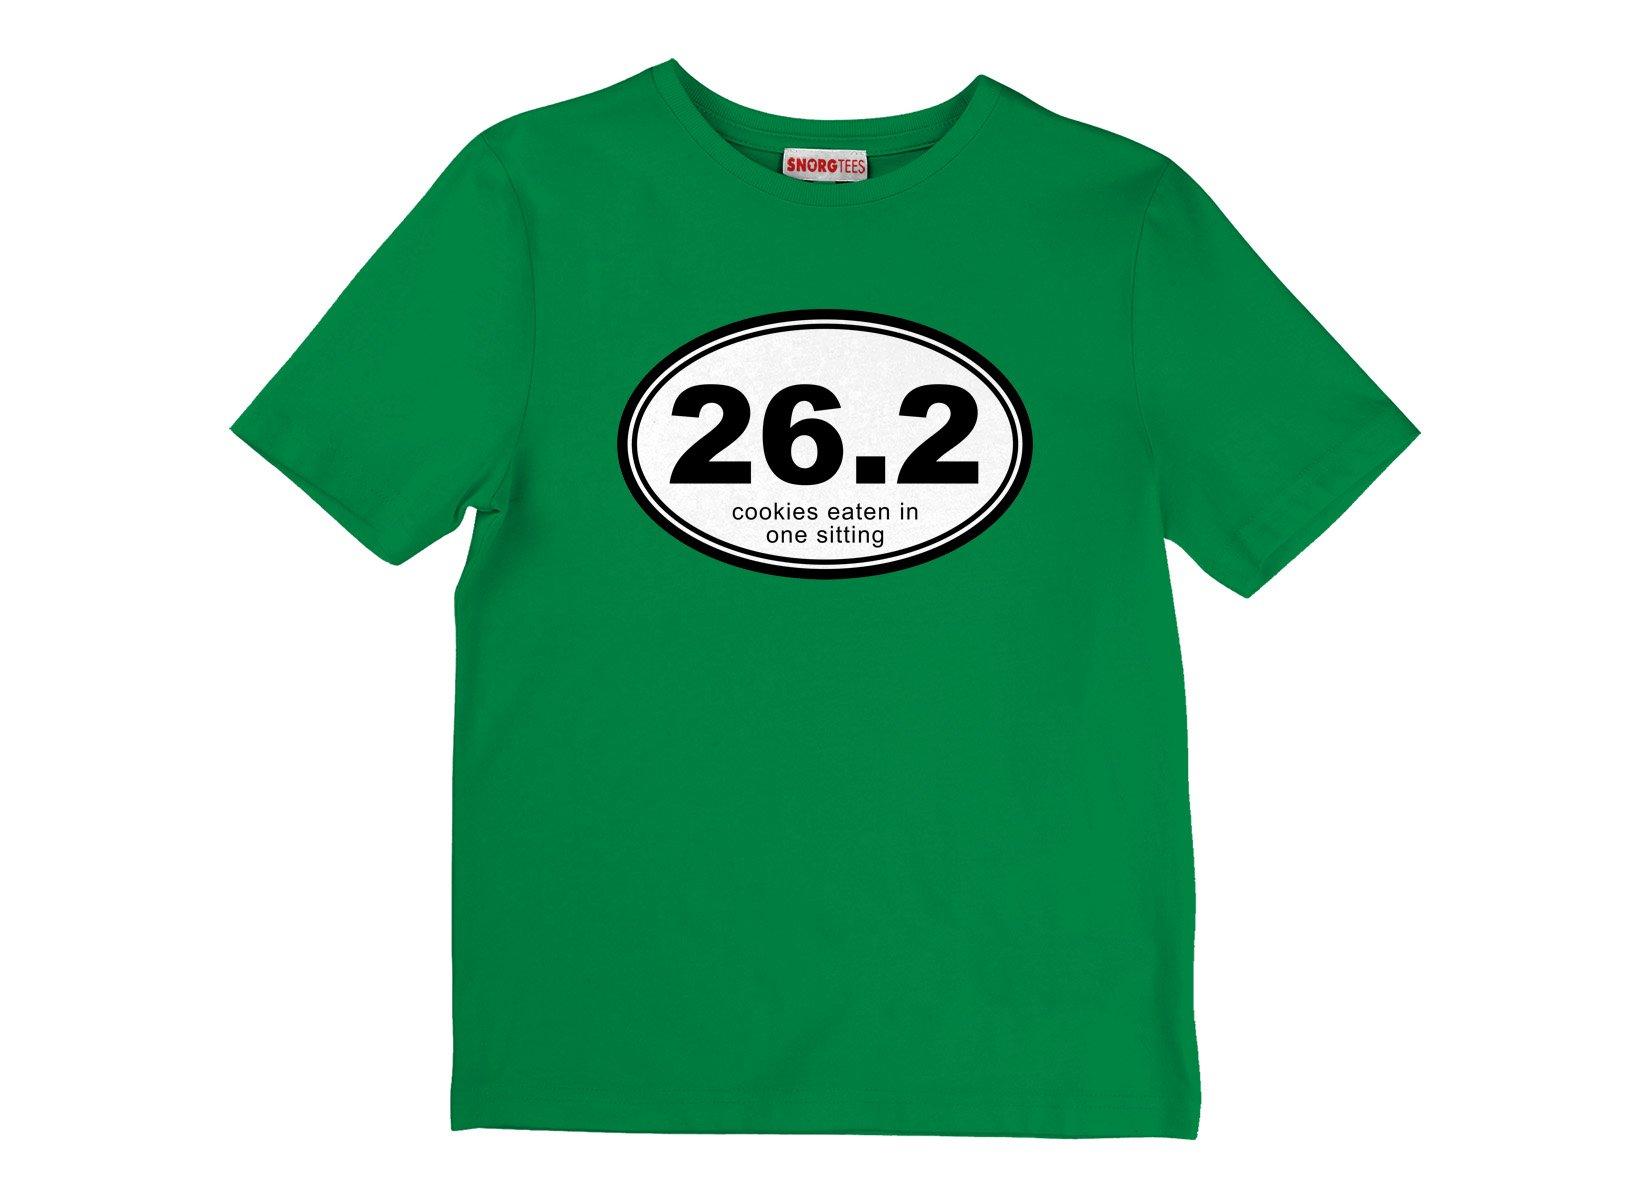 26.2 Cookies Eaten In One Sitting on Kids T-Shirt